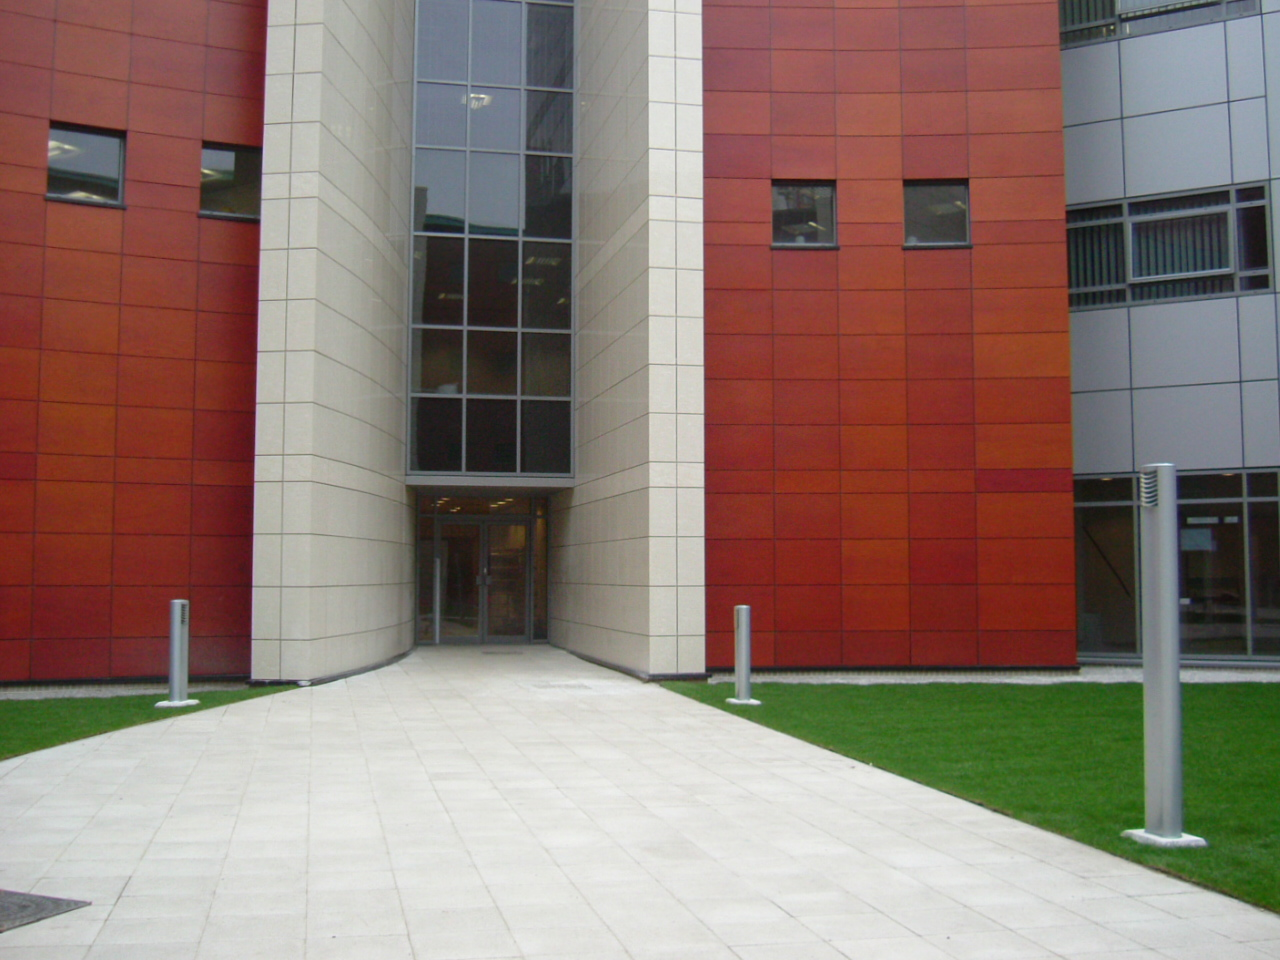 projects_6745689-SalfordUniversity.jpg